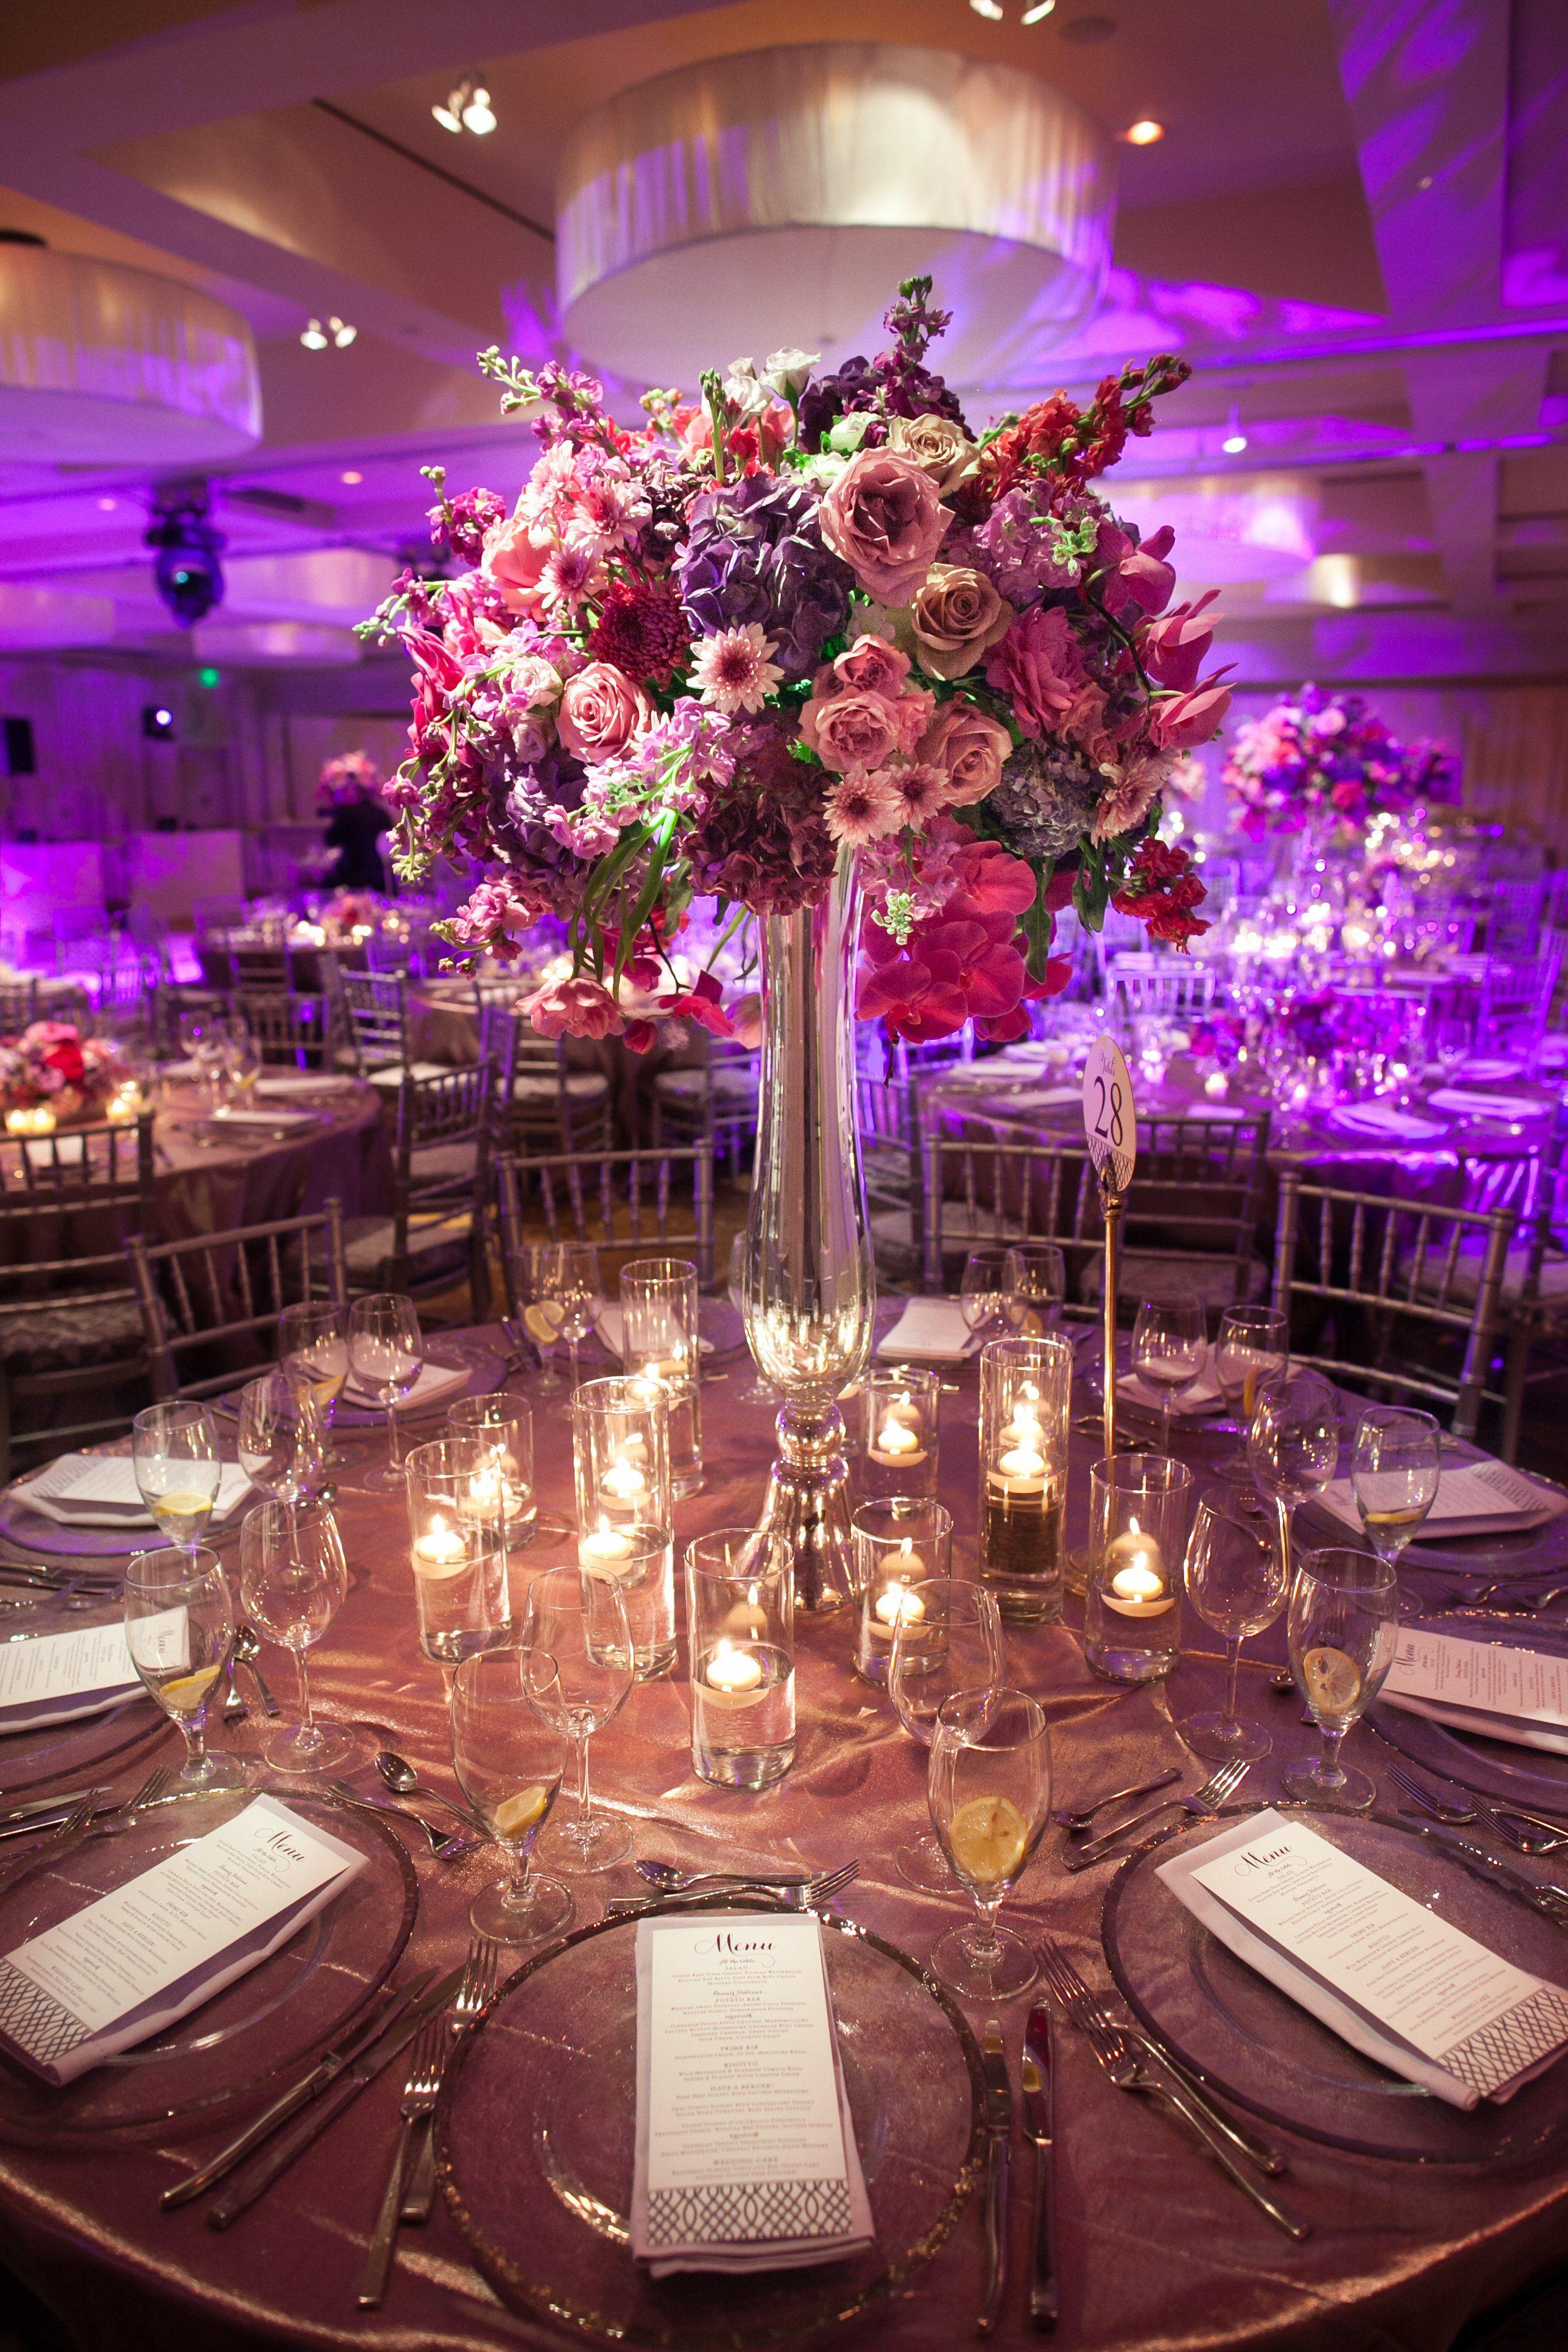 Wedding decoration ideas purple  Tall Purple Centerpiece  Future wedding  Pinterest  Centerpieces